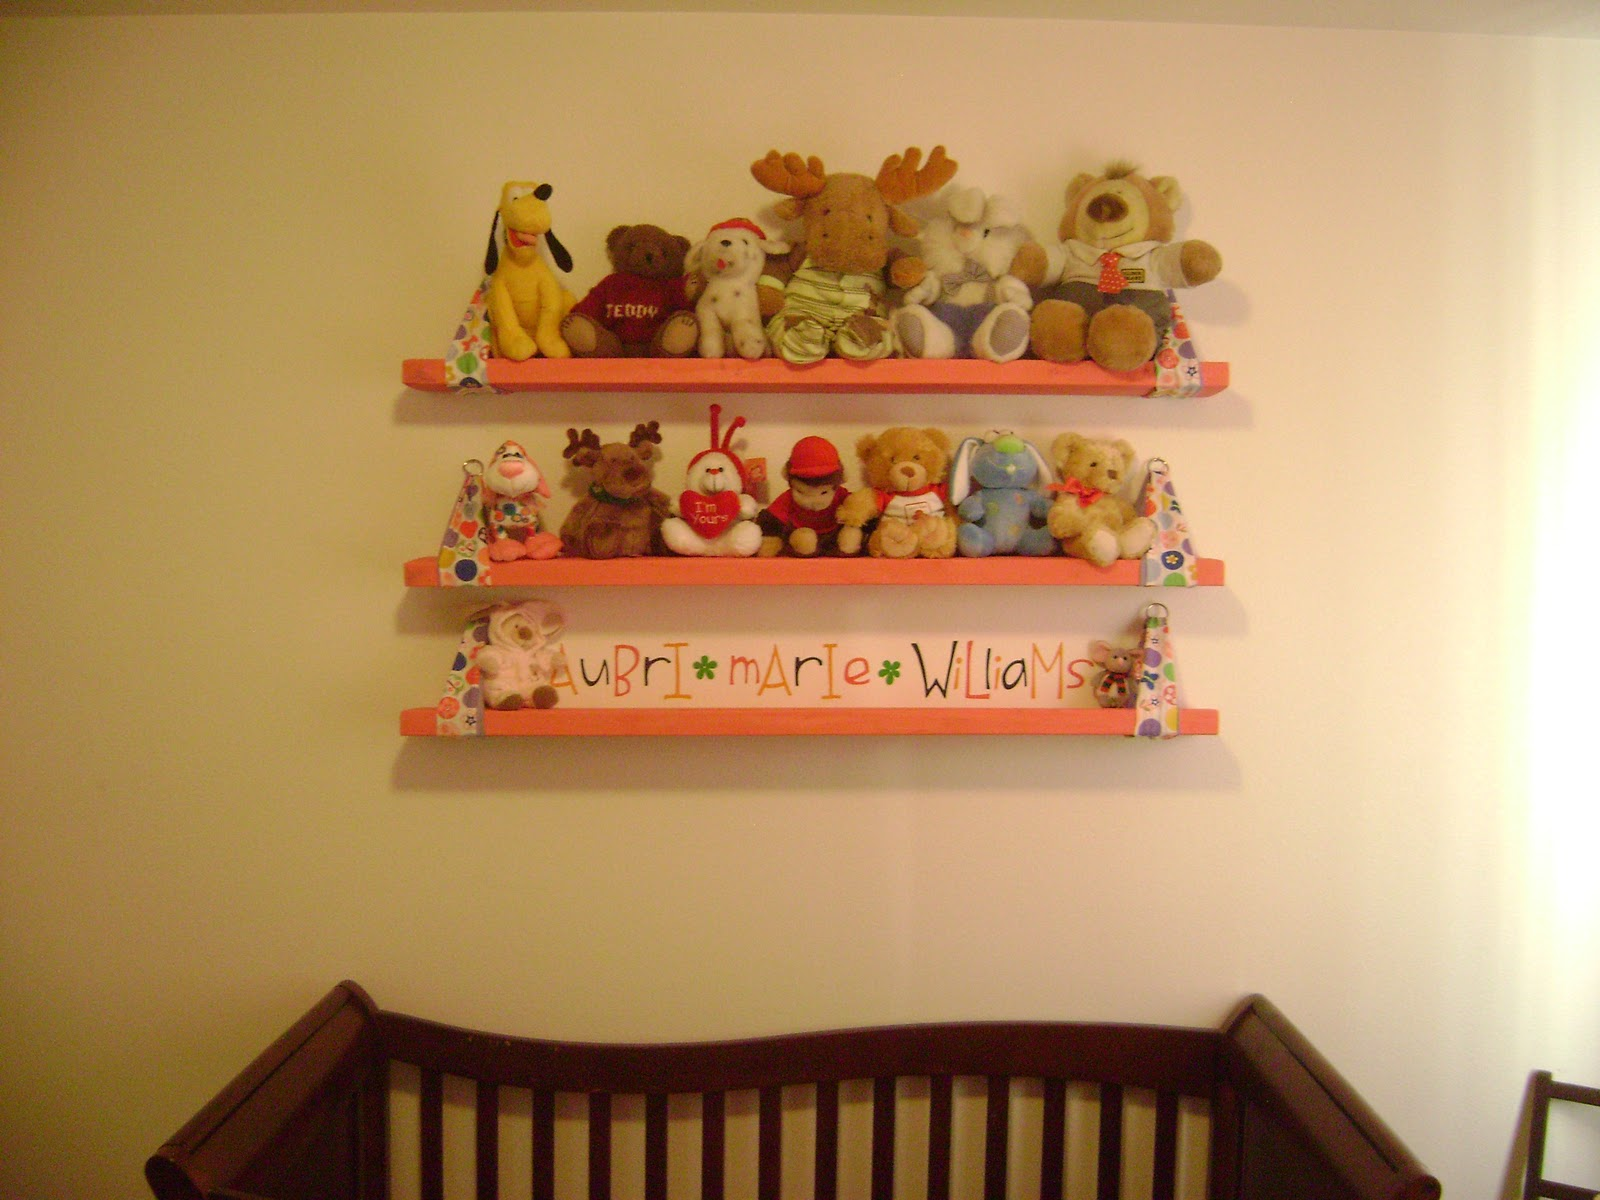 ricki s craft corner stuffed animal shelves rh rickiscraftcorner blogspot com stuffed toy shelves Stuffed Animal Net